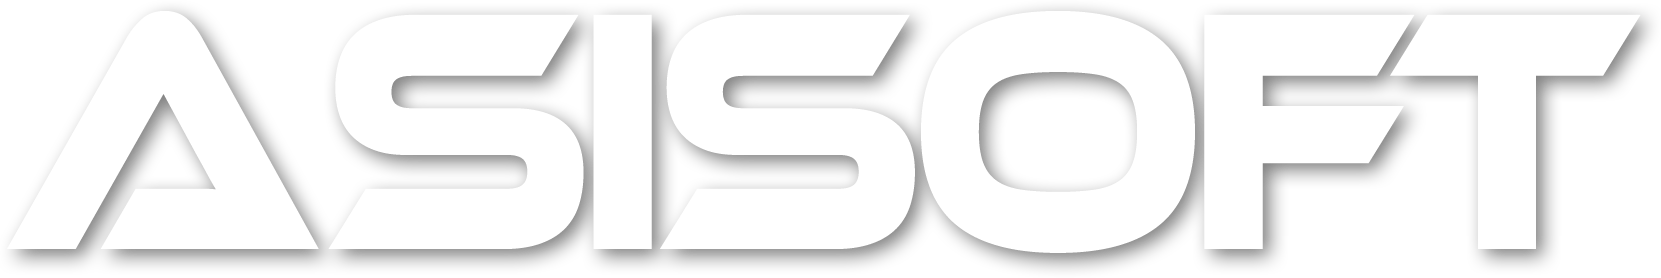 logo asisoft v1